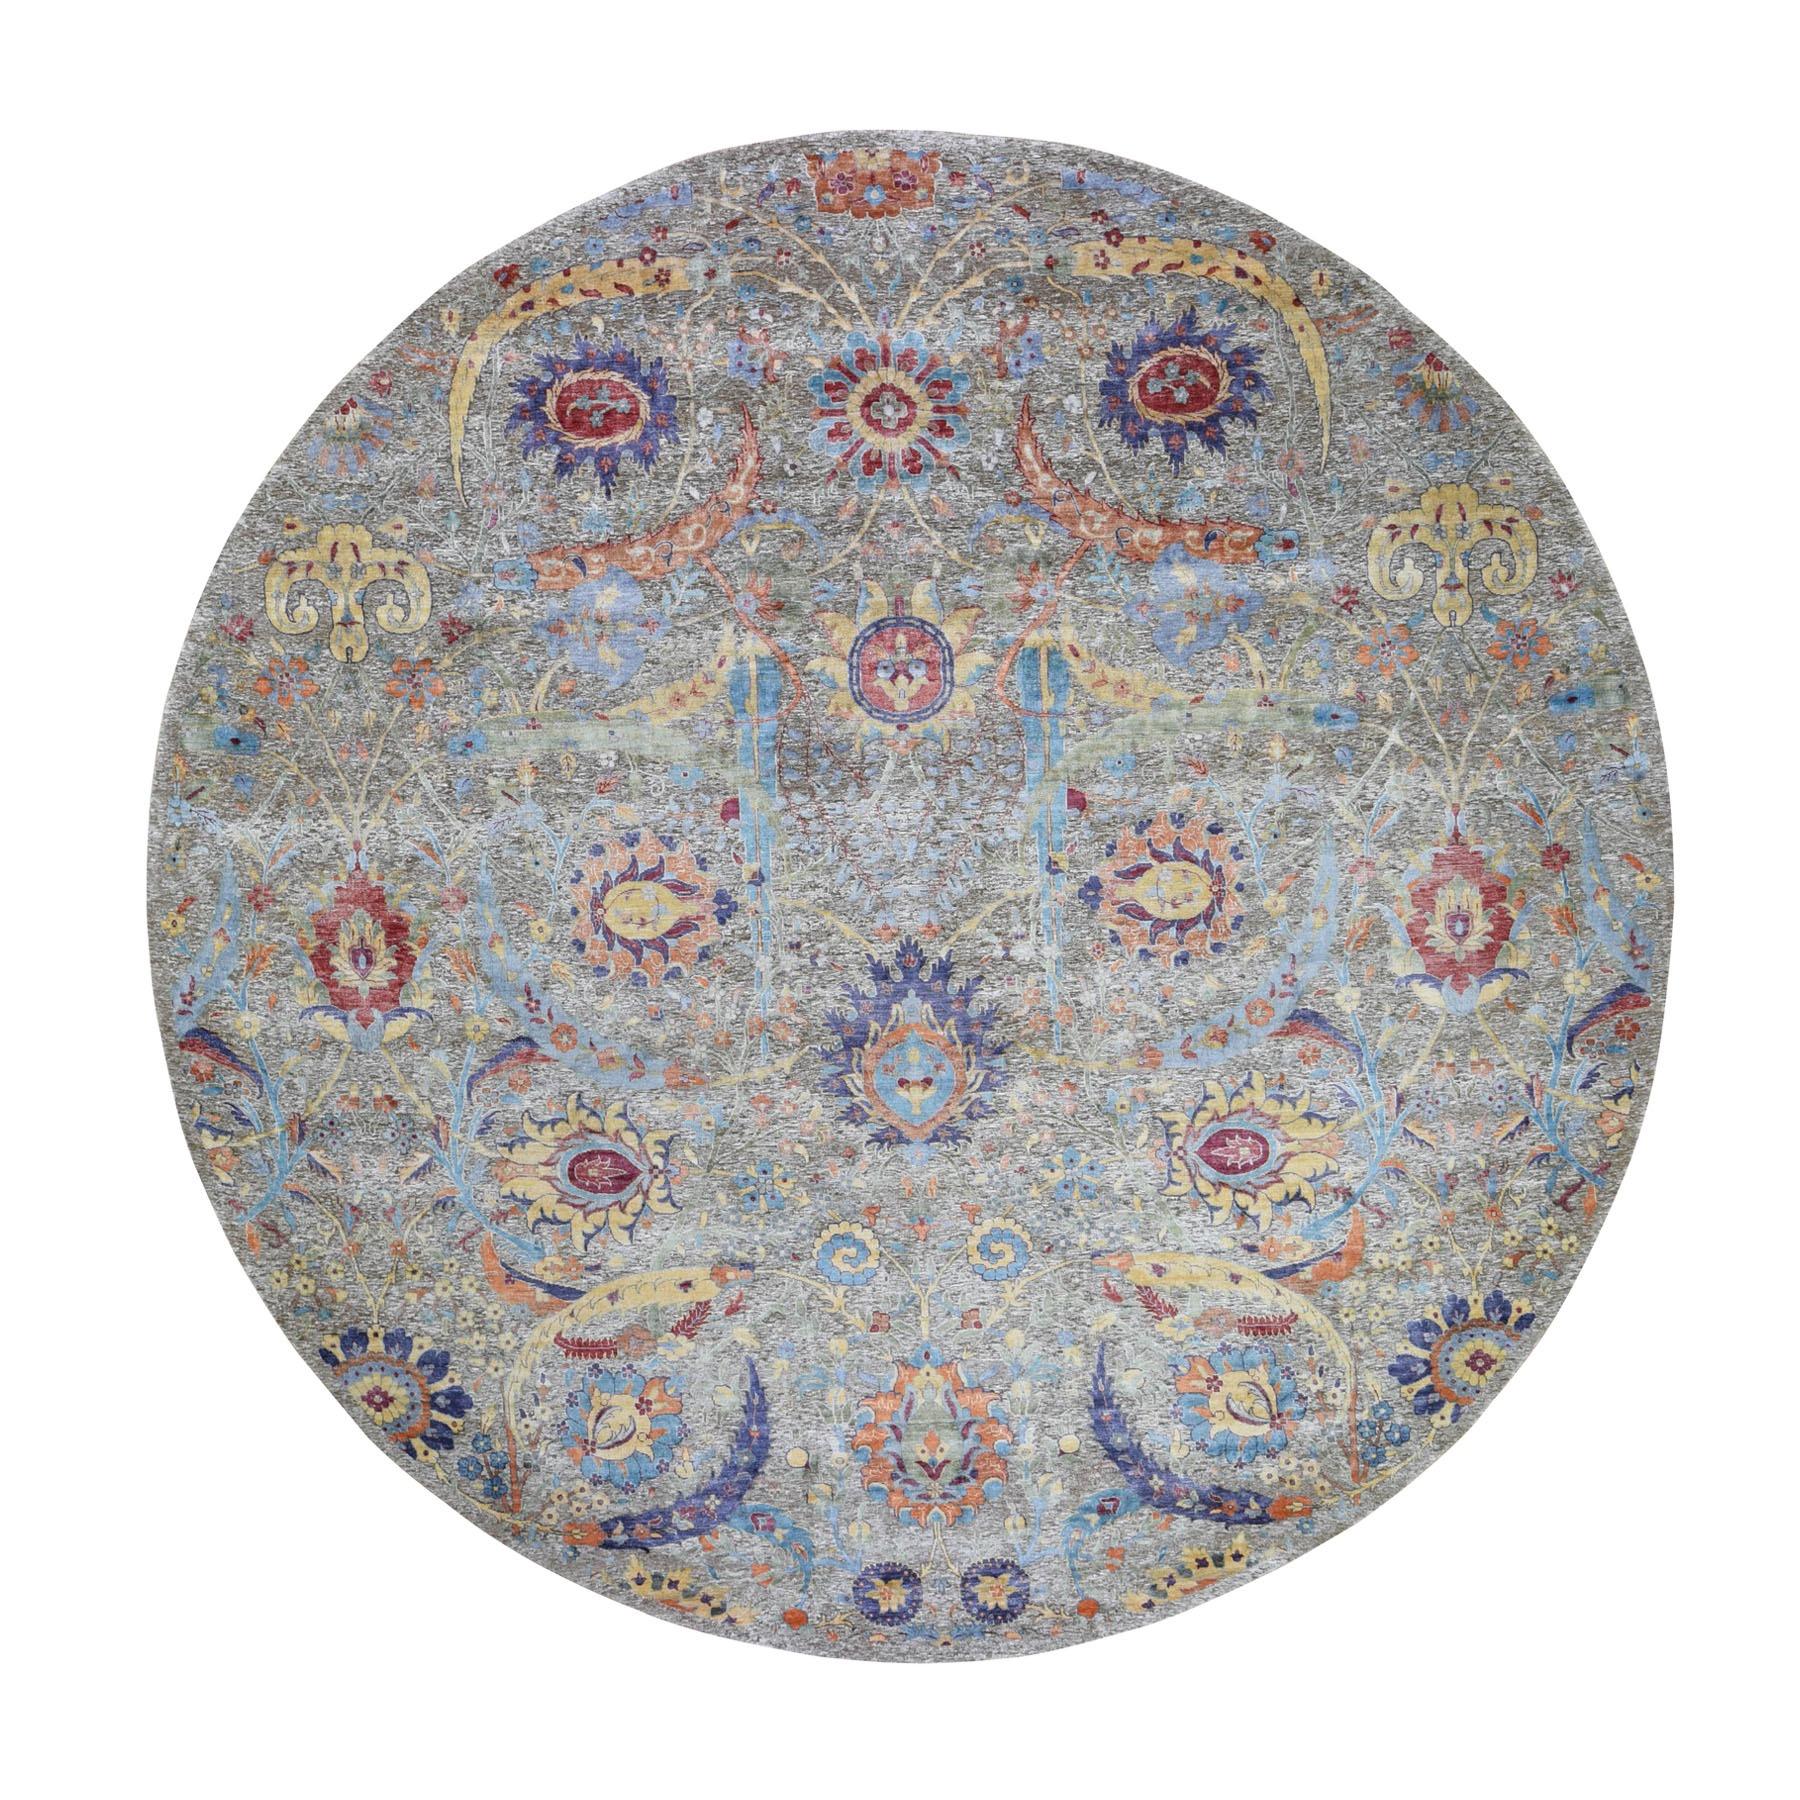 12'x12'  Round Sickle Leaf Design Silk With Textured Wool Hand Knotted Oriental Rug